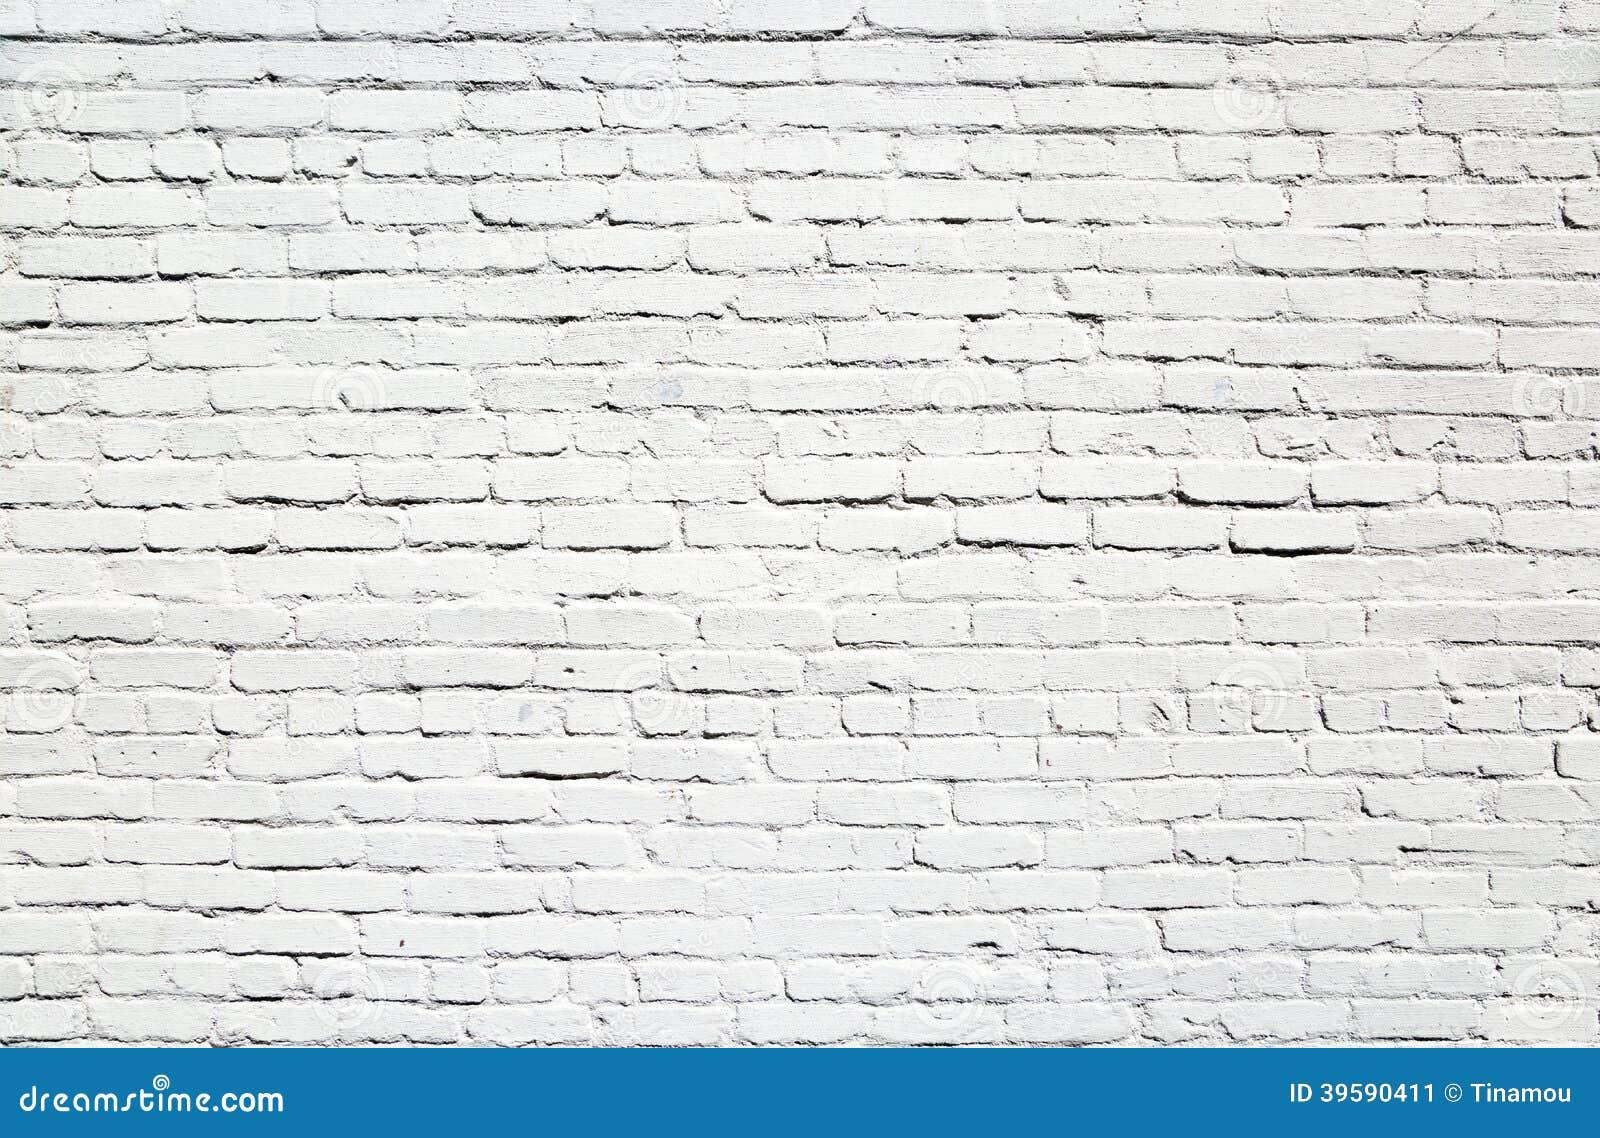 Кирпичная белая стена фон для фотошопа